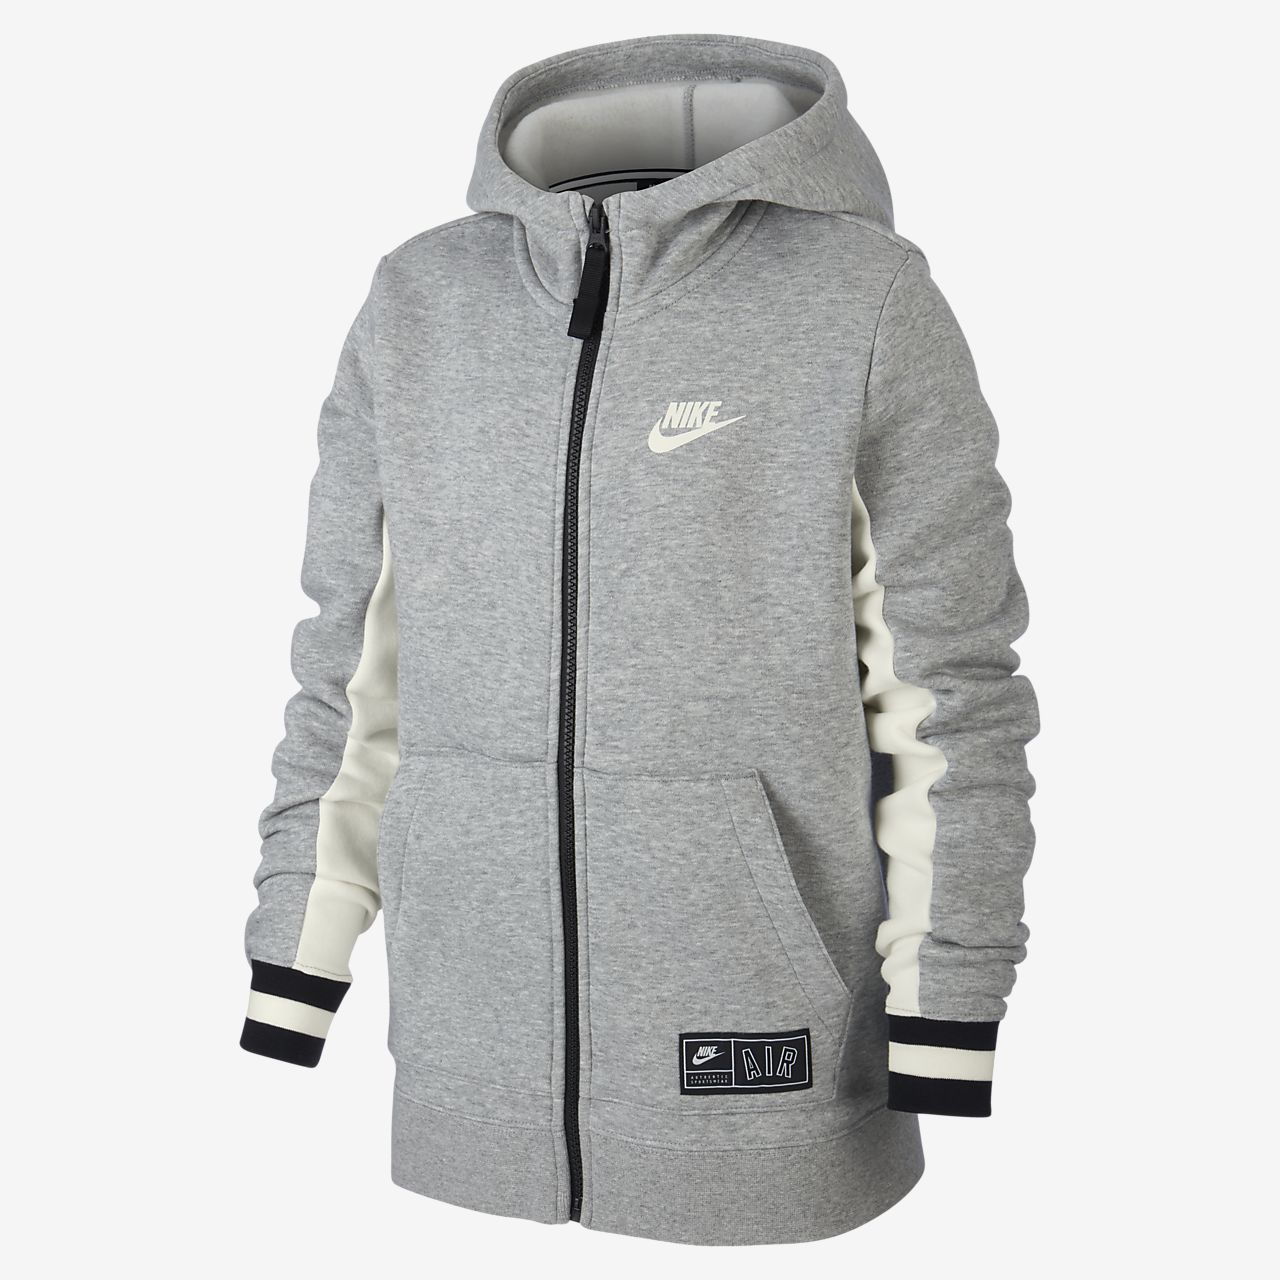 Nike Sportswear Older Kids'(Boys') Full Zip Hoodie Green